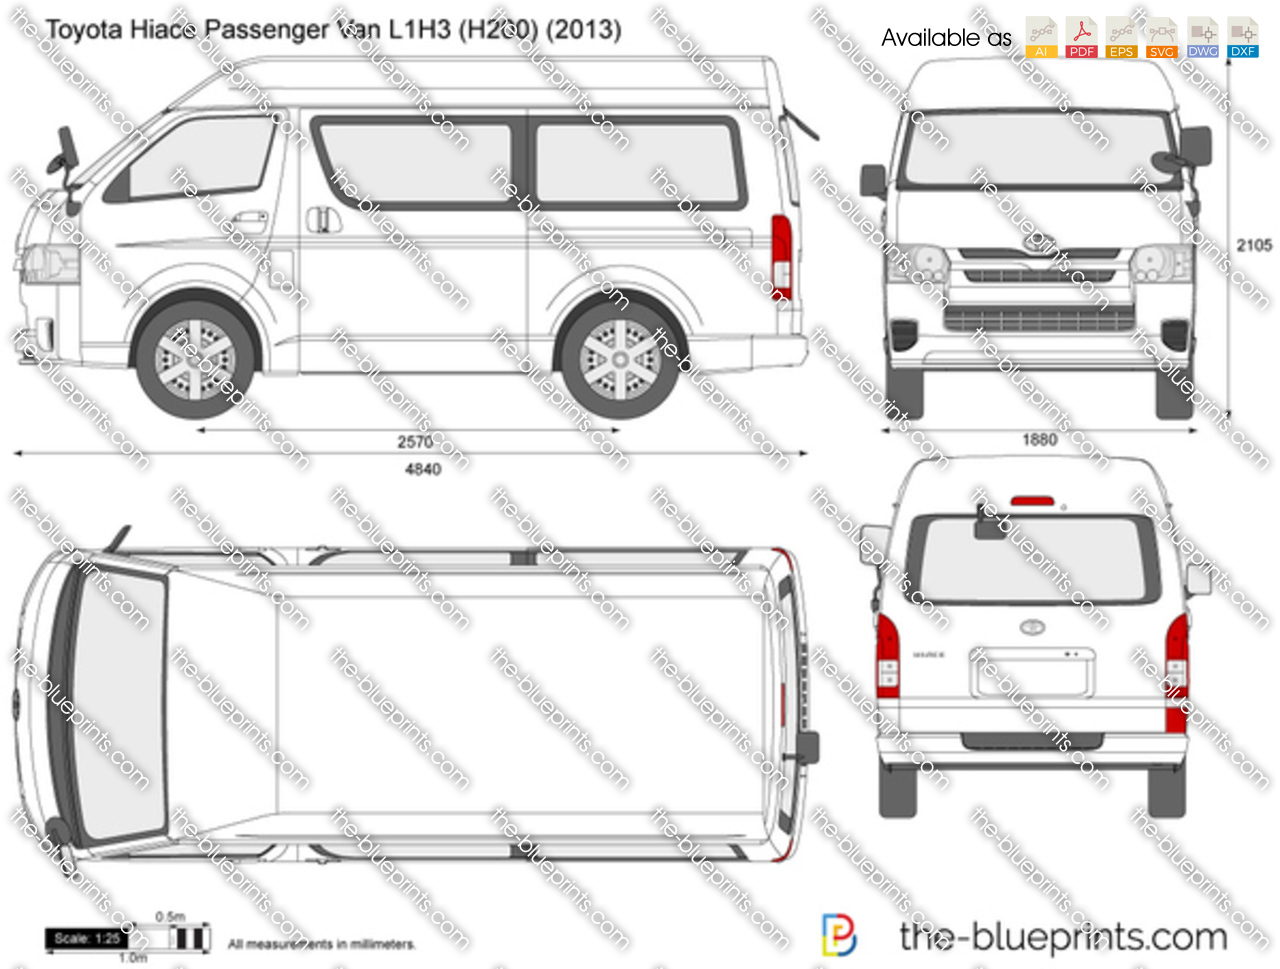 Toyota Hiace Passenger Van L1H3 H200